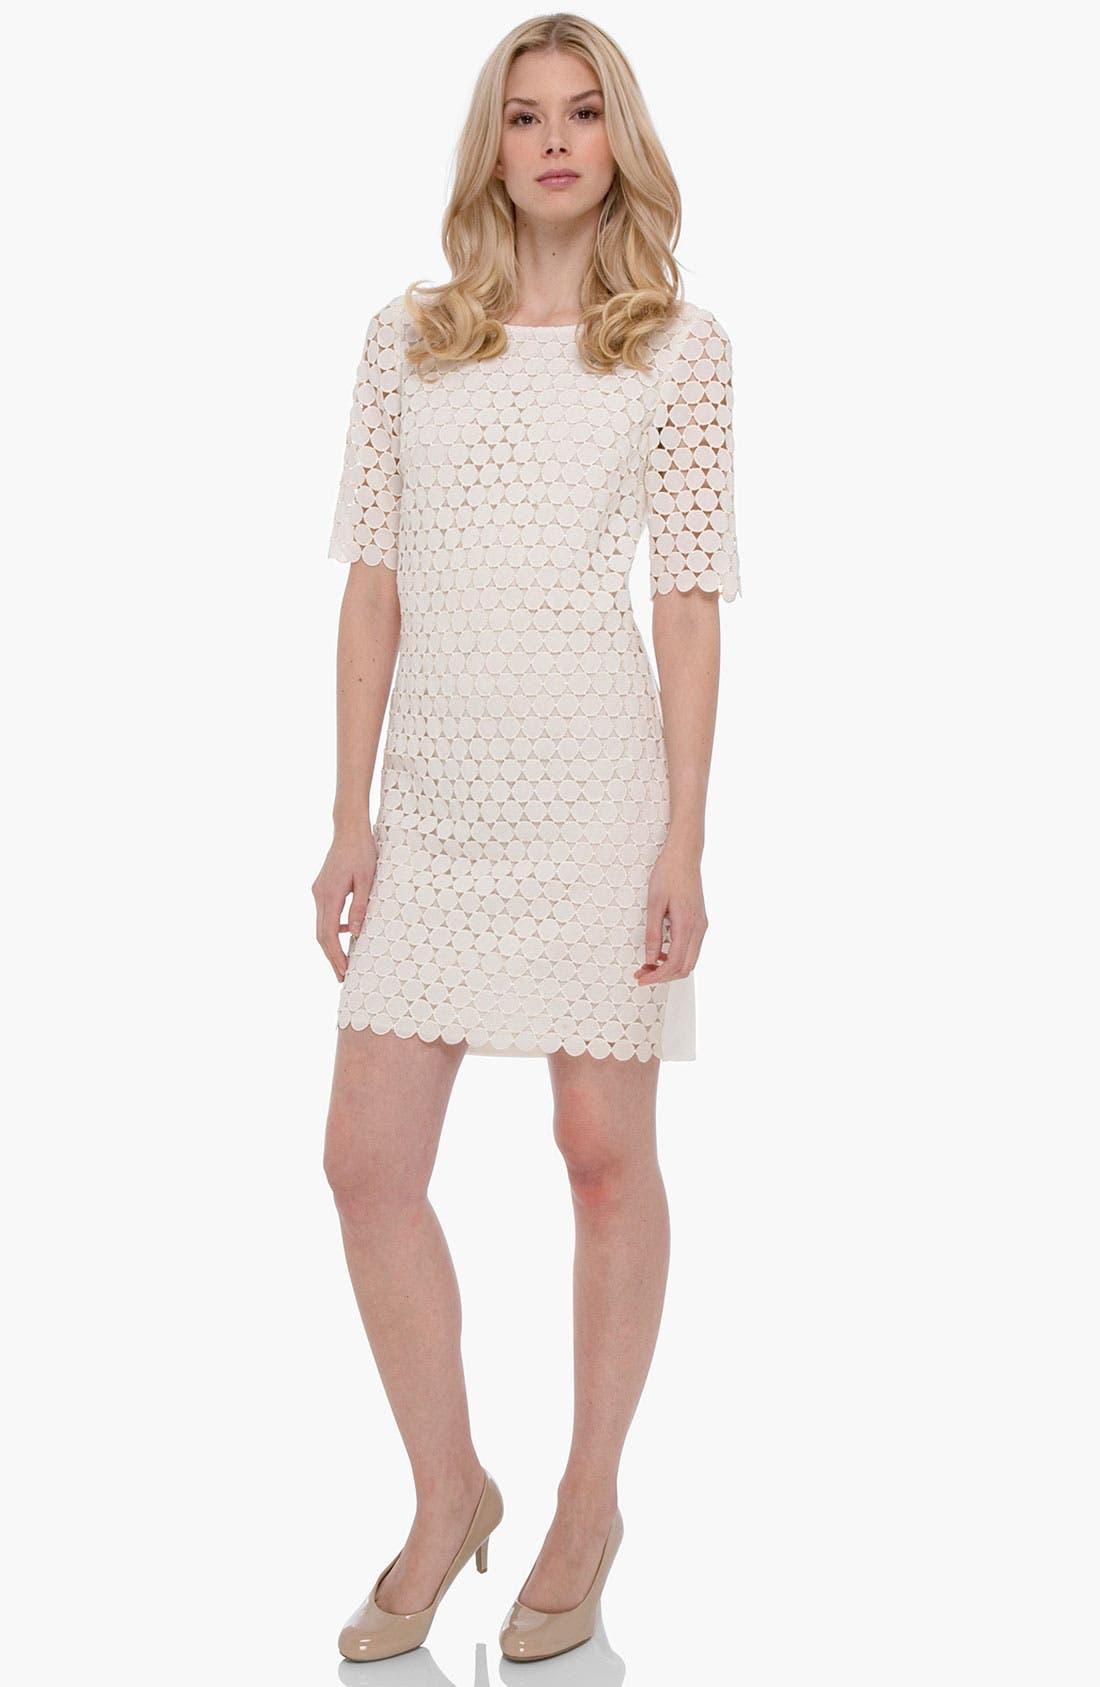 Main Image - Catherine Catherine Malandrino 'Tammy' Dress